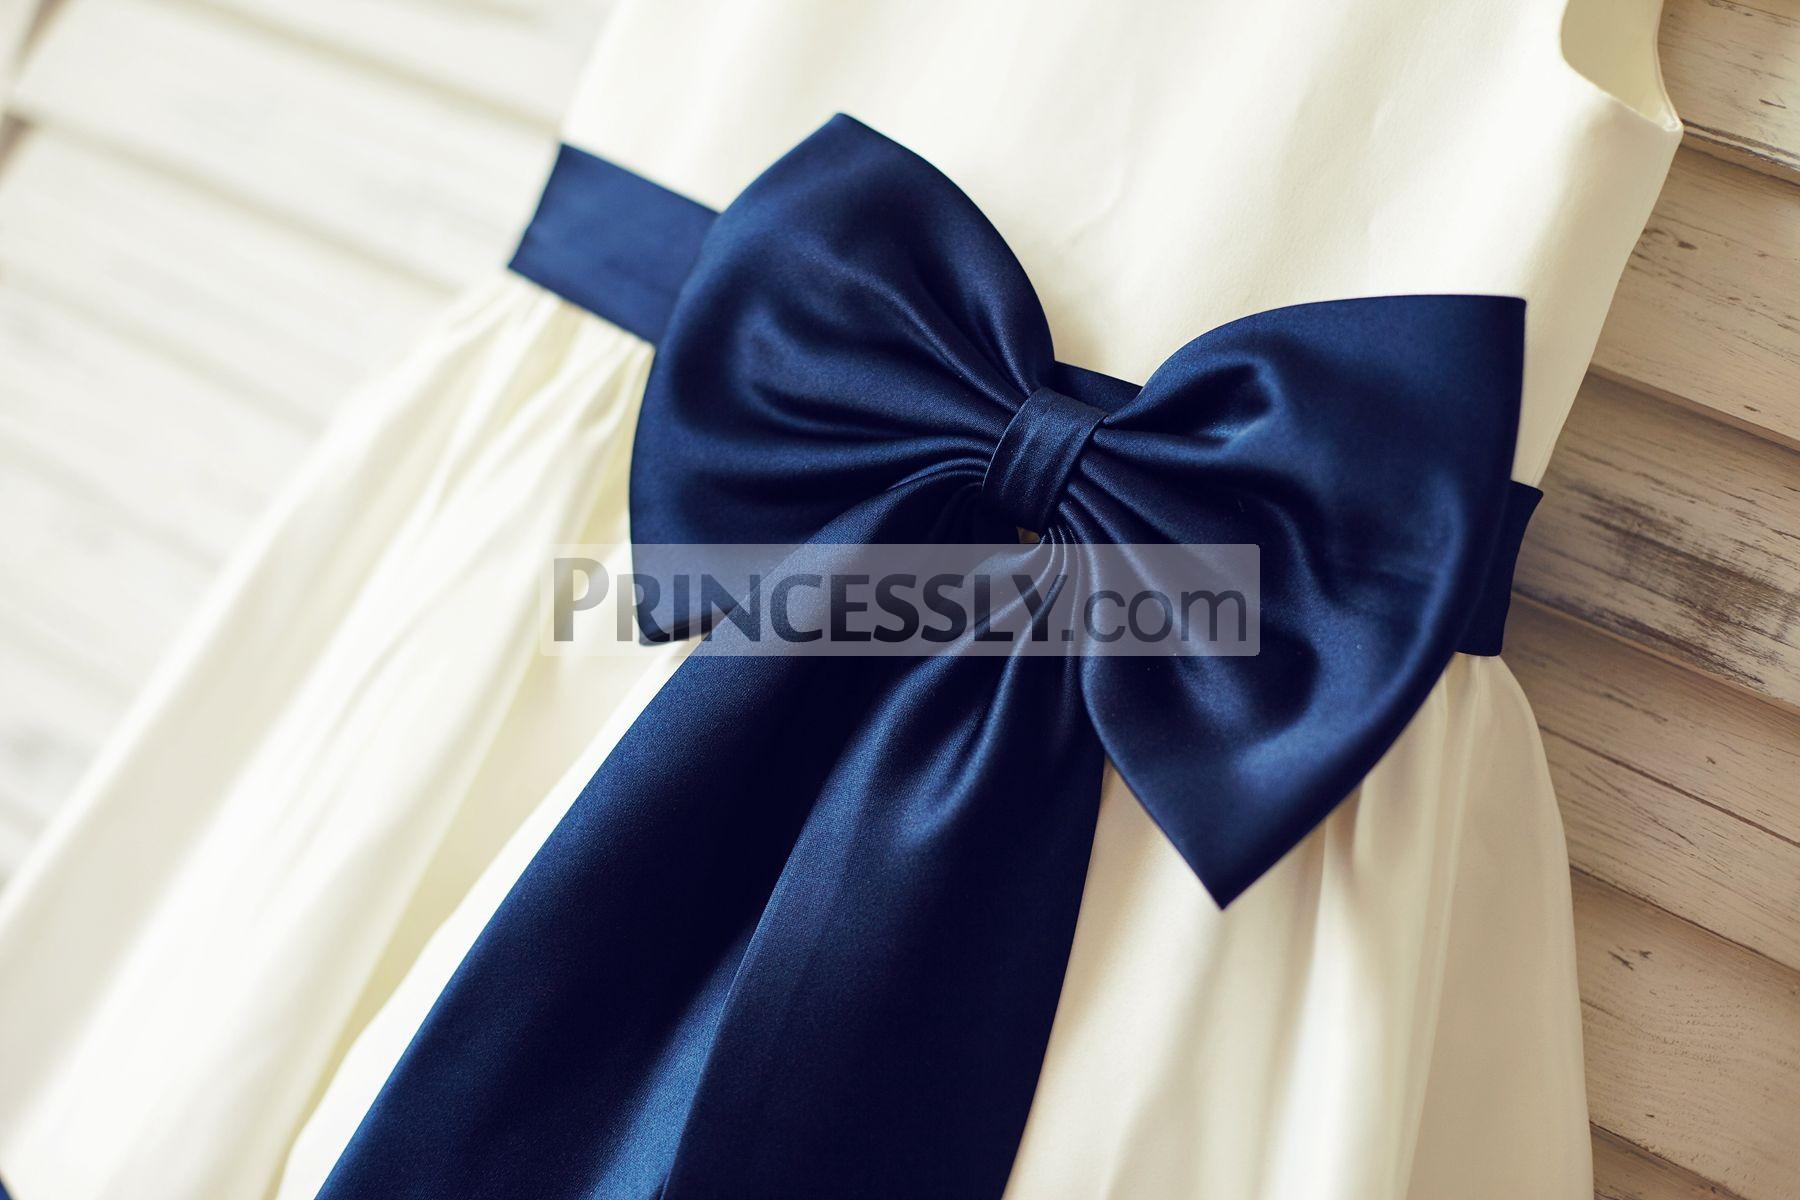 Stylized Navy Blue Bow